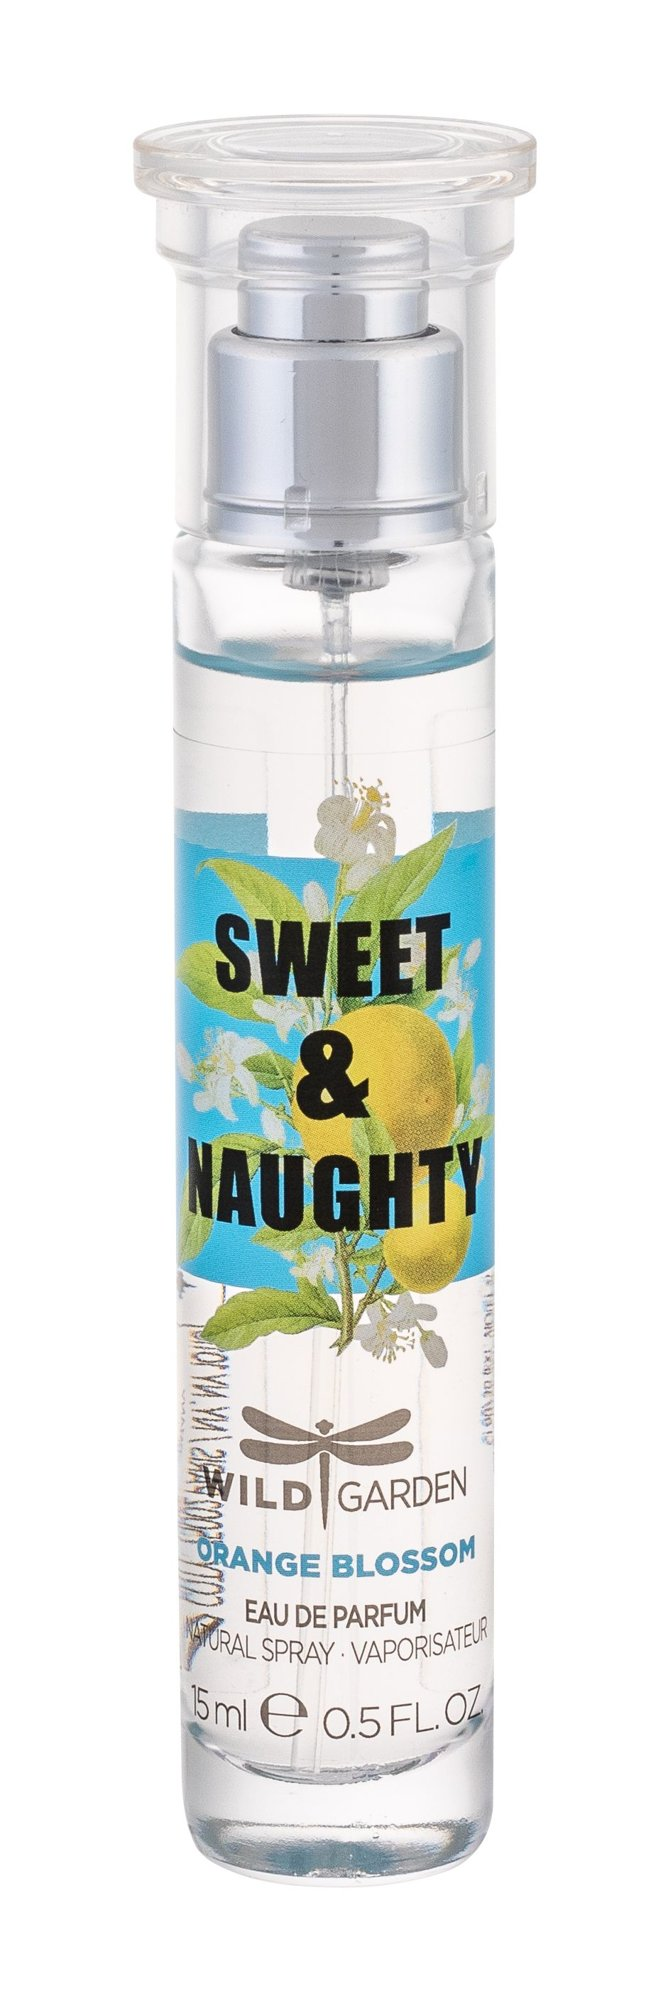 Wild Garden Sweet & Naughty Eau de Parfum 15ml